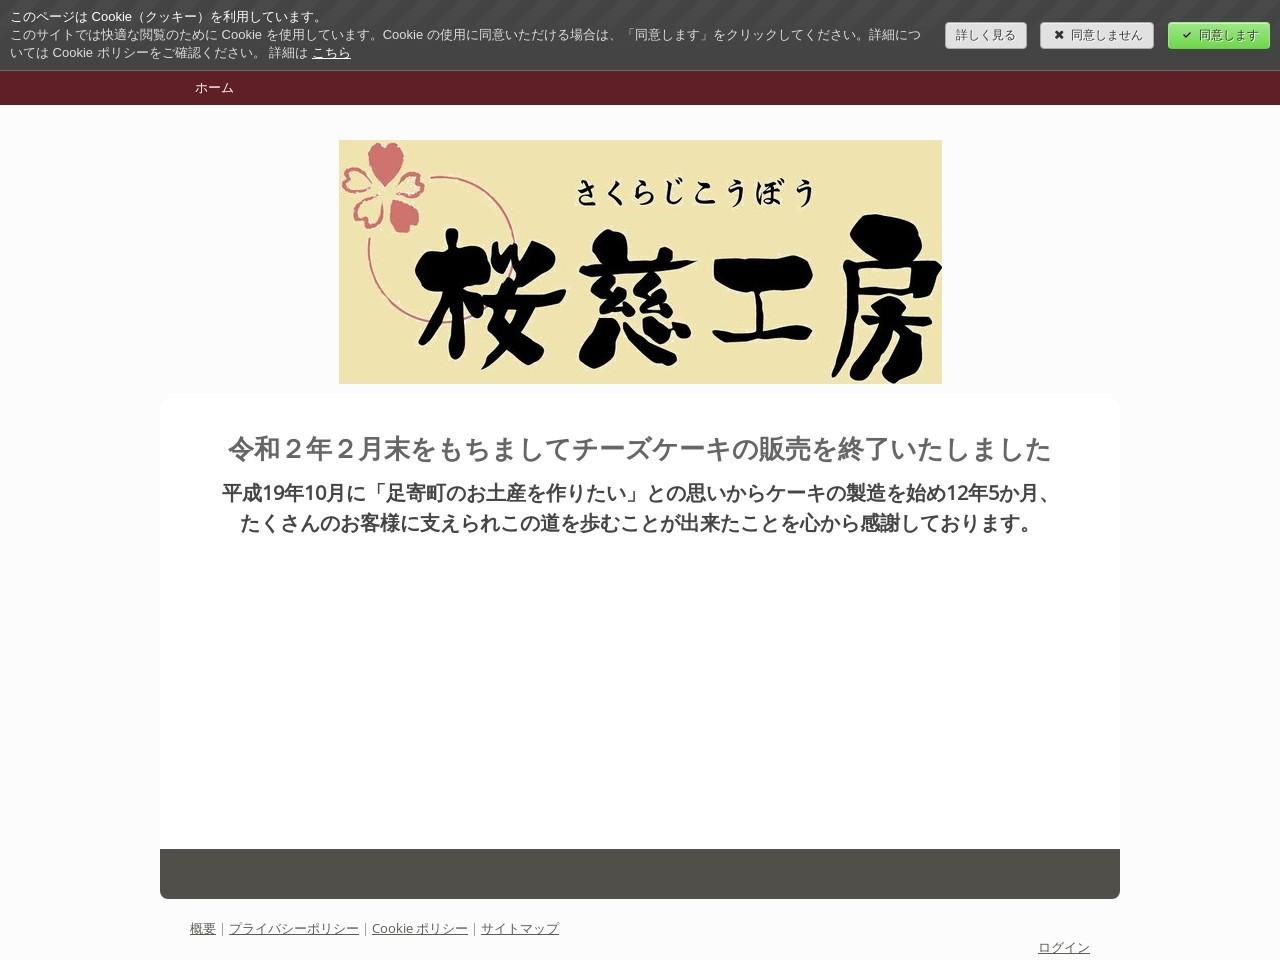 http://www.sakuraji.com